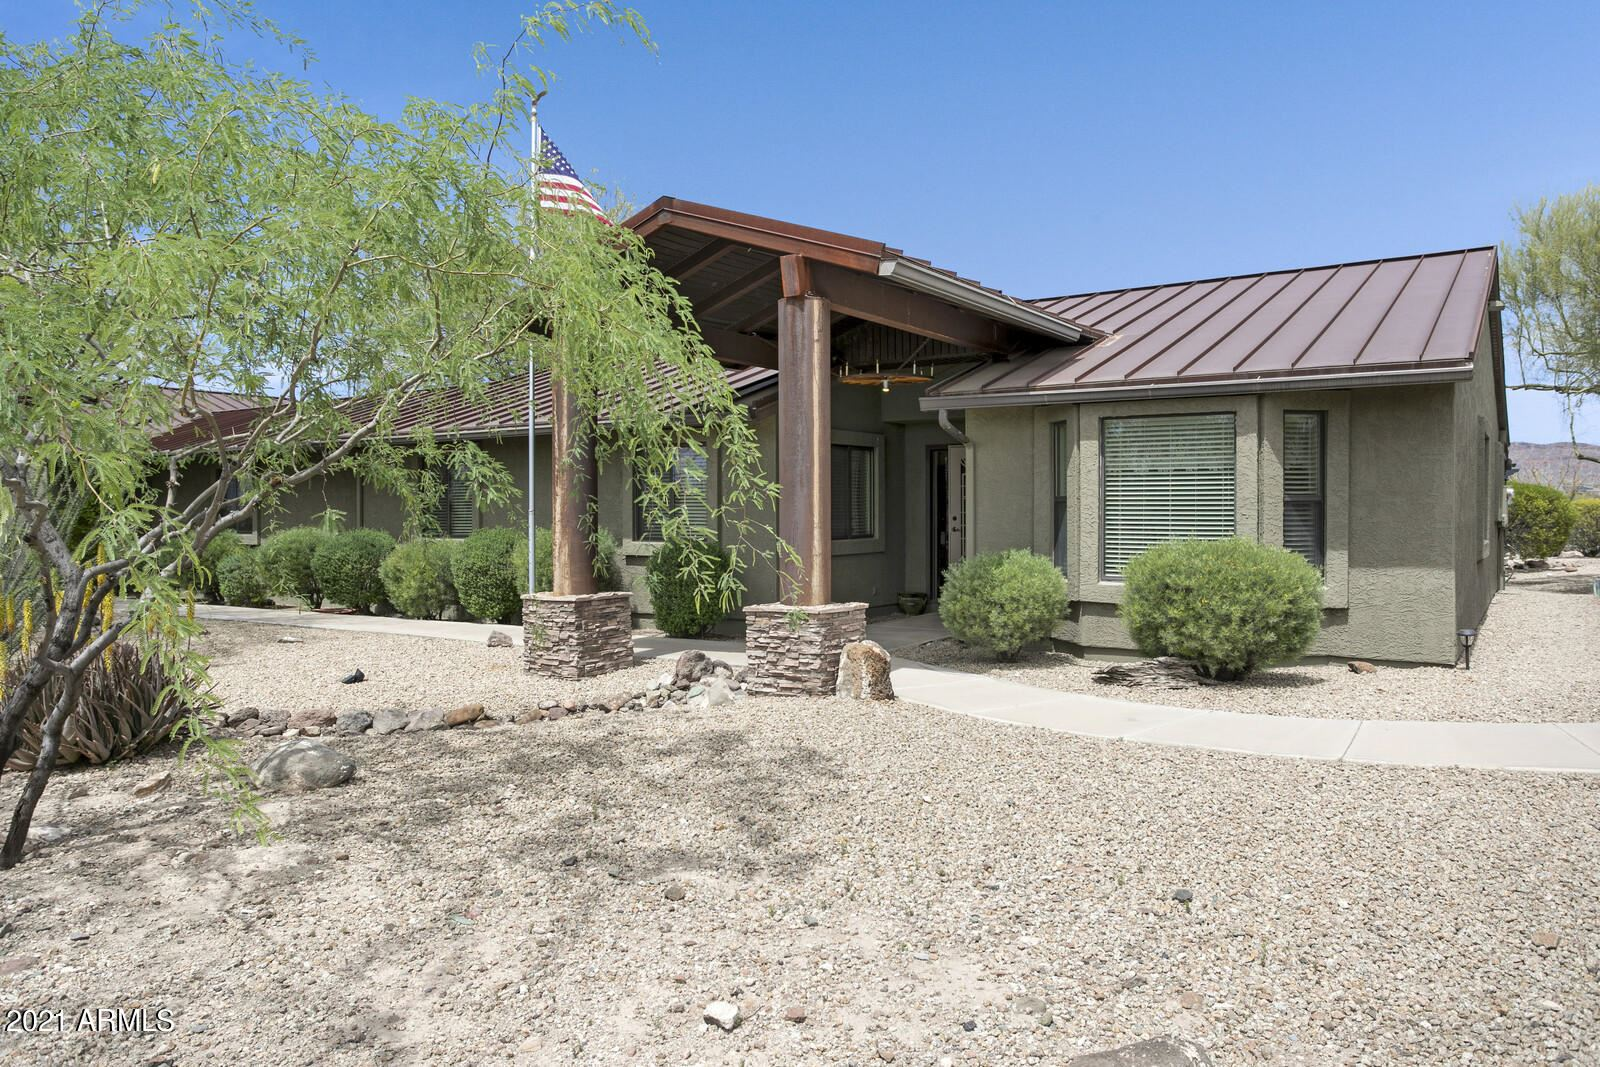 Photo of 106 W RIDGECREST Road, Desert Hills, AZ 85086 (MLS # 6222129)